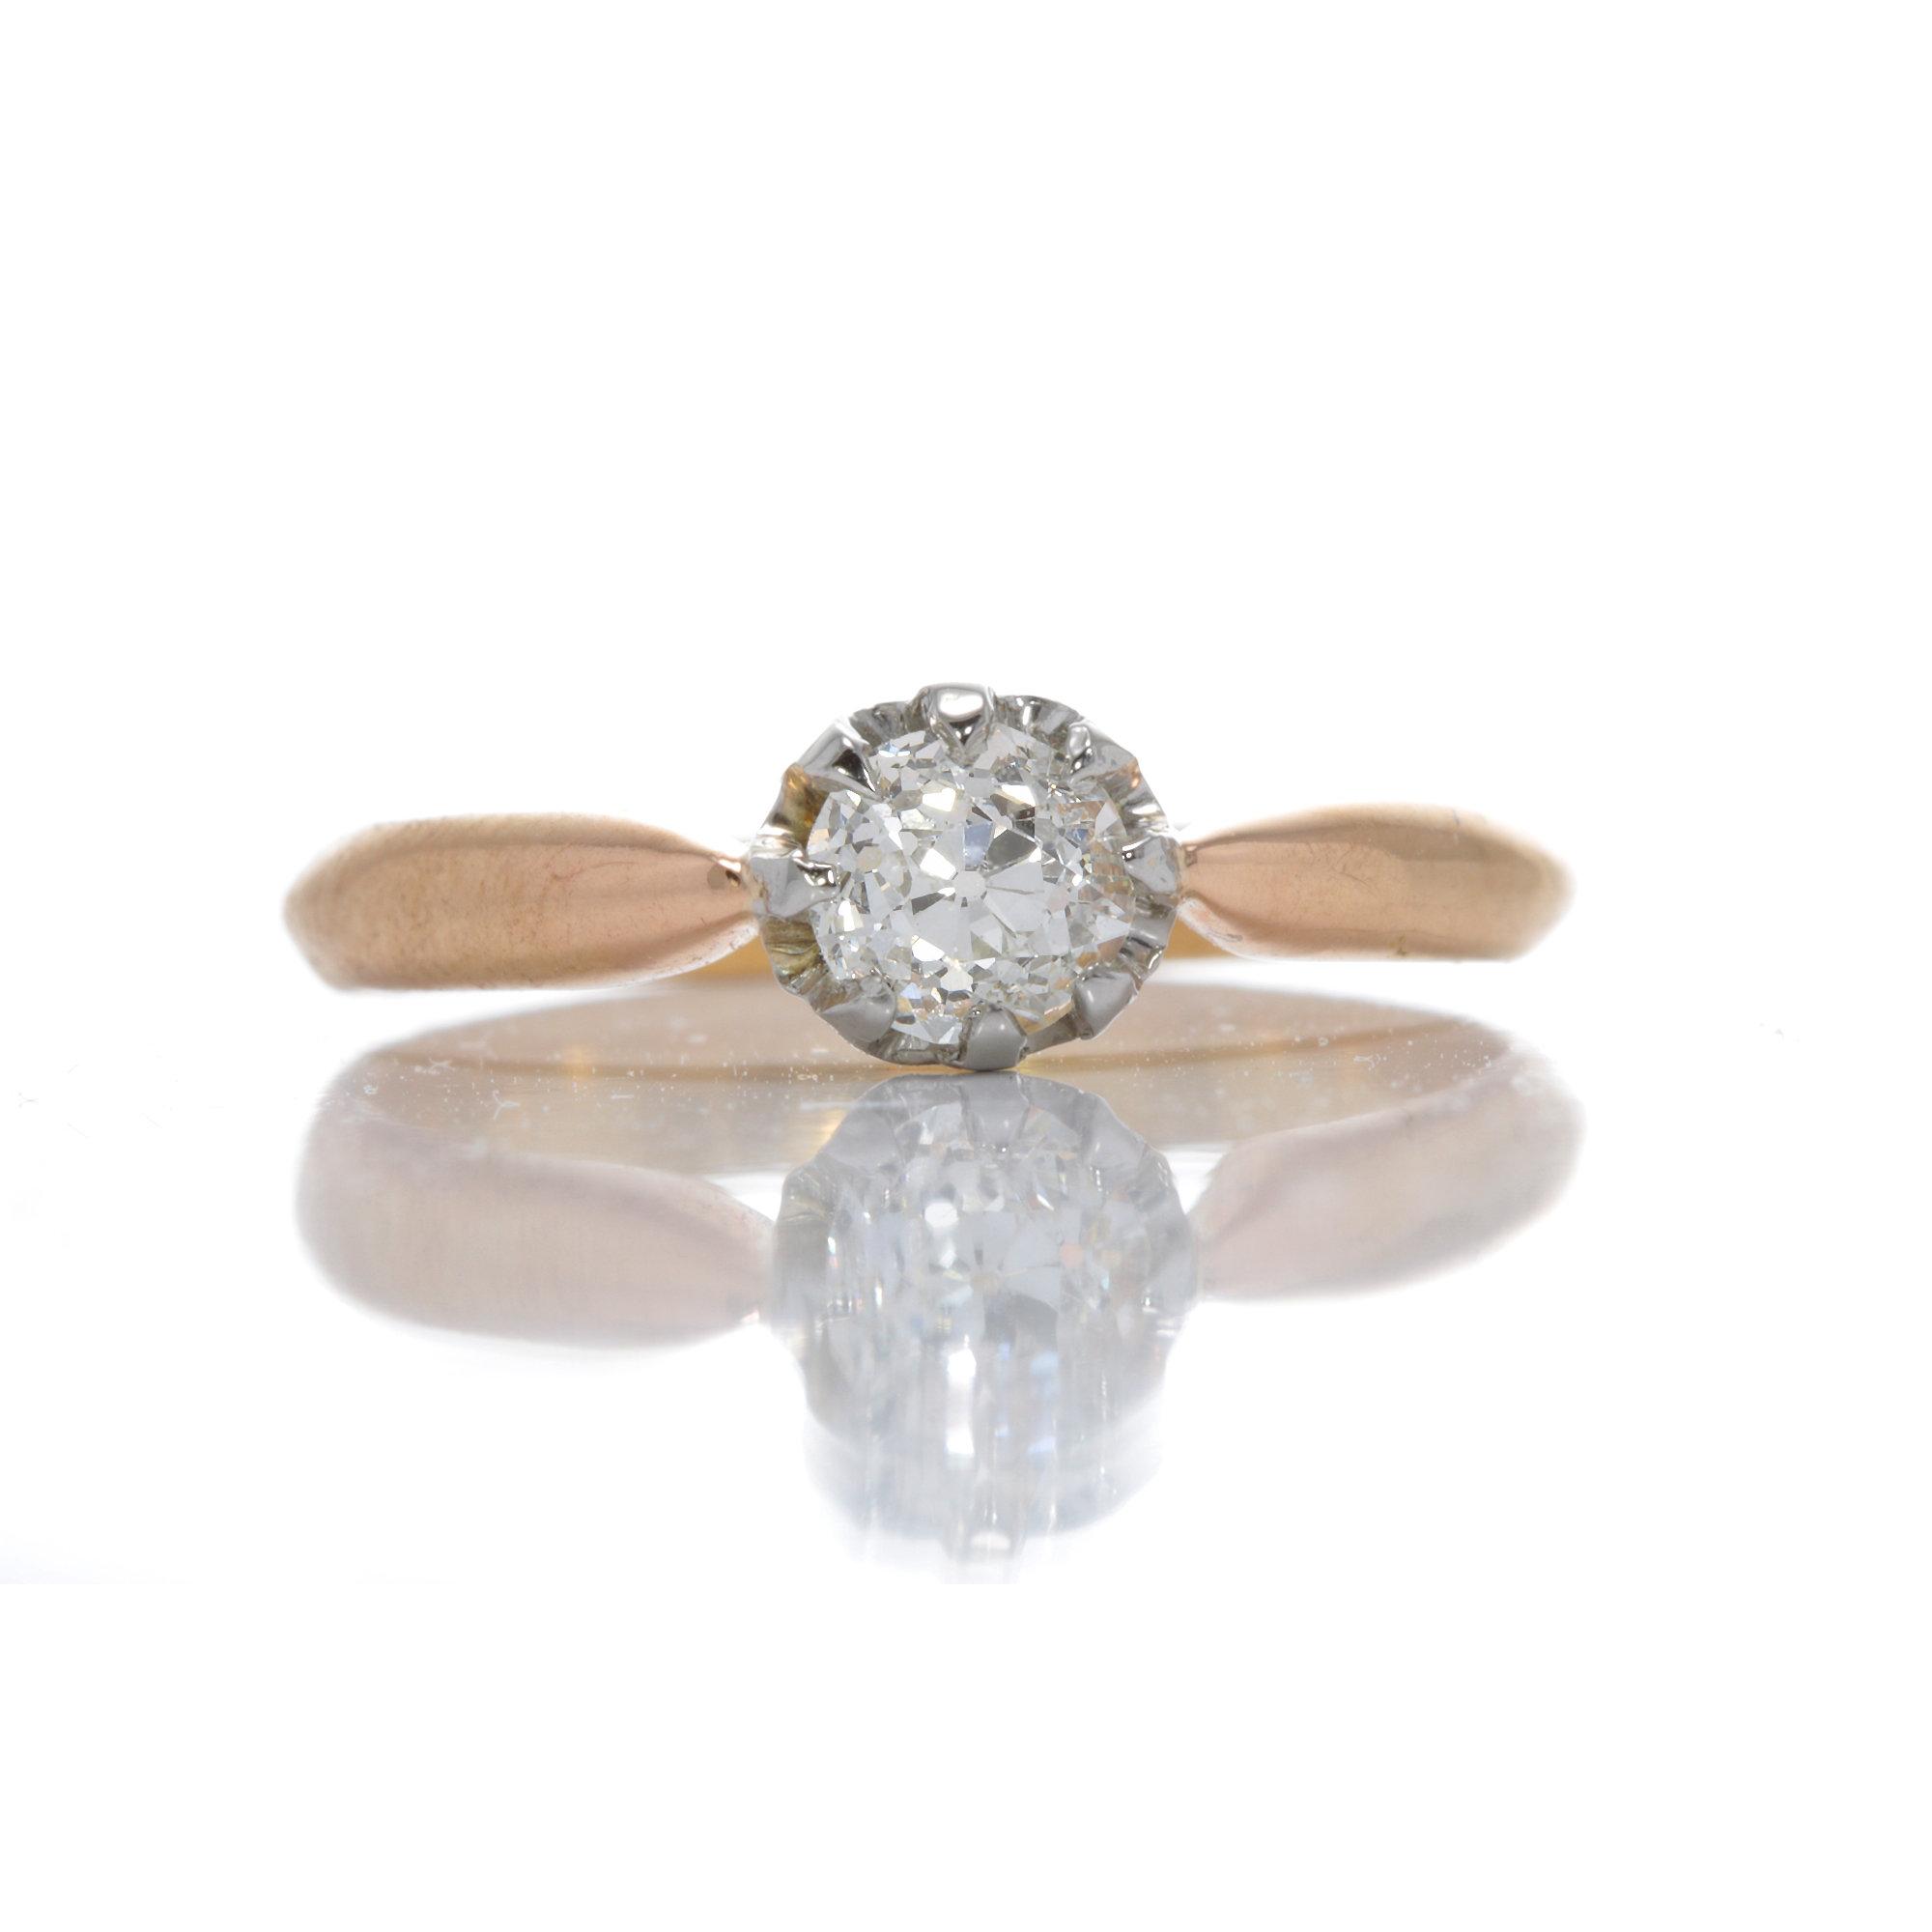 Vintage Diamond engagement ring .46ct j vs2 old European. Platinum. 18kt.  1920s.